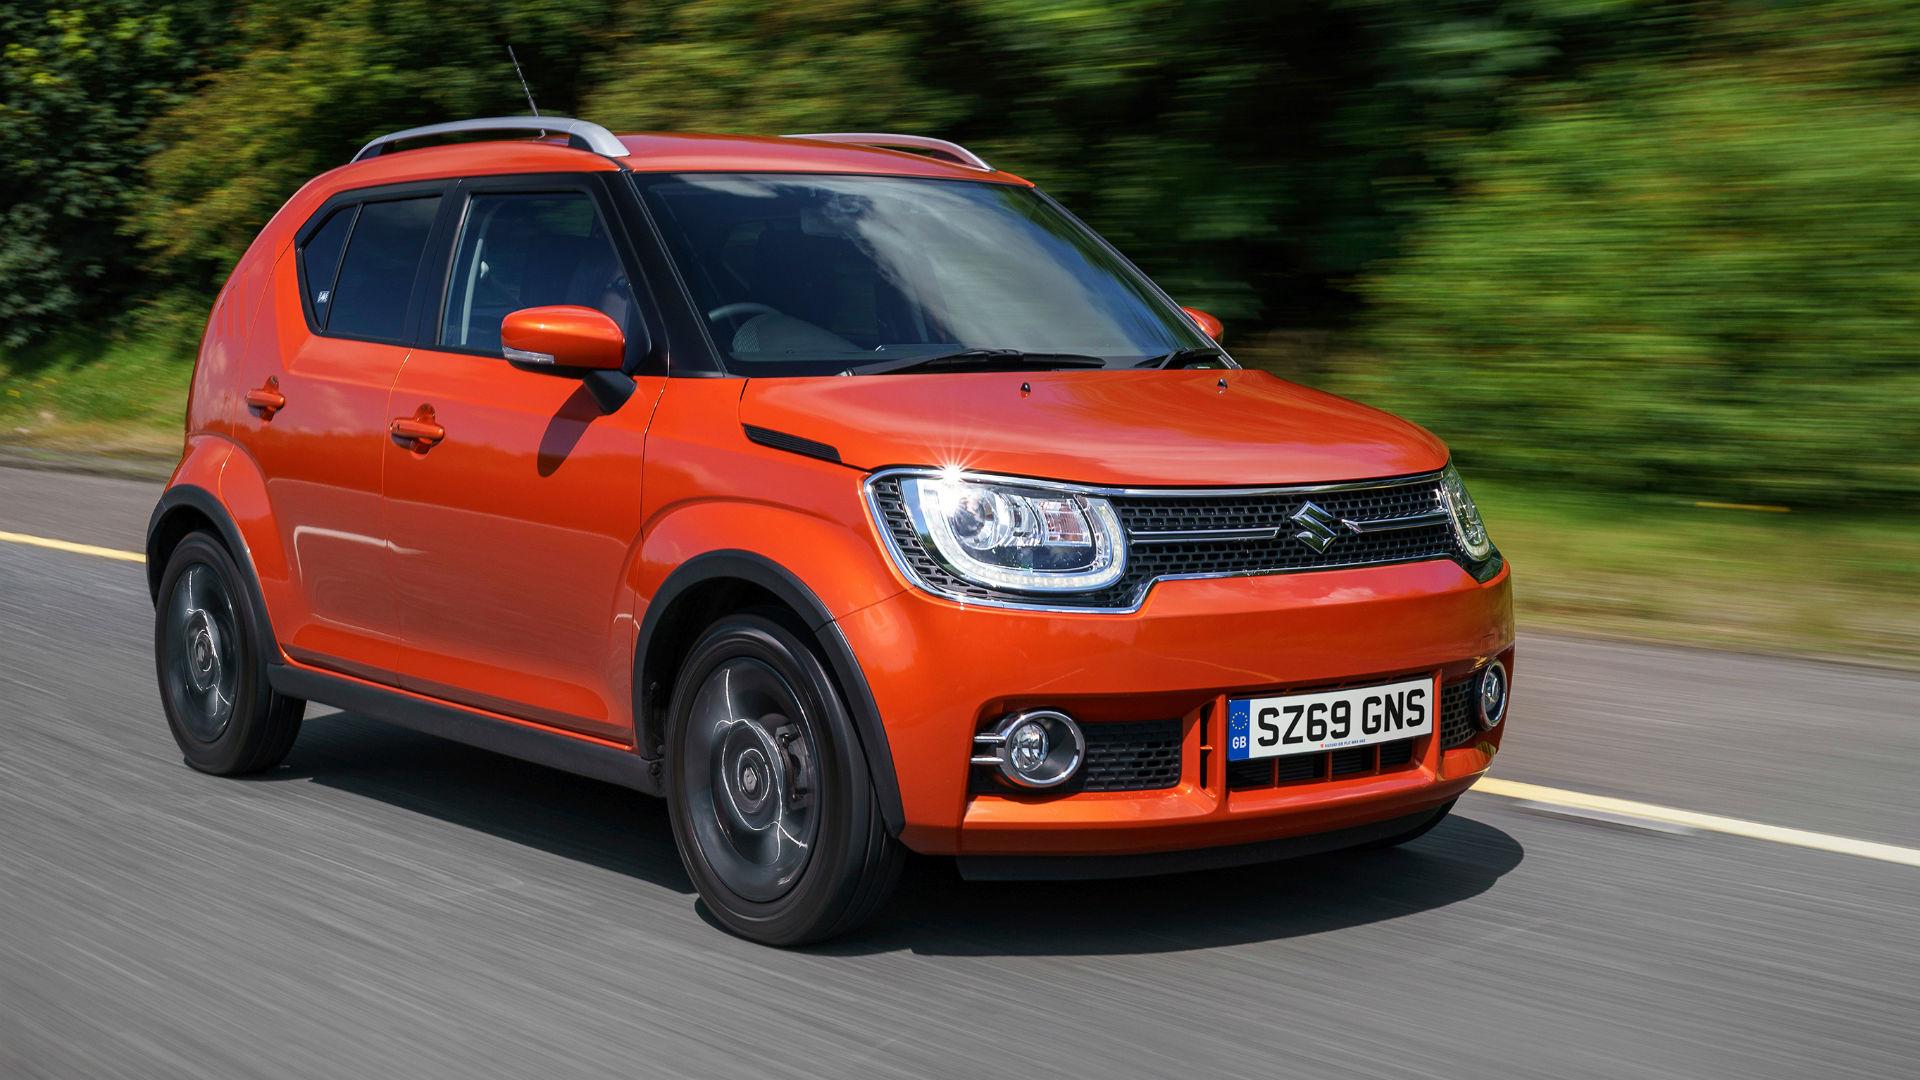 Suzuki Ignis offers